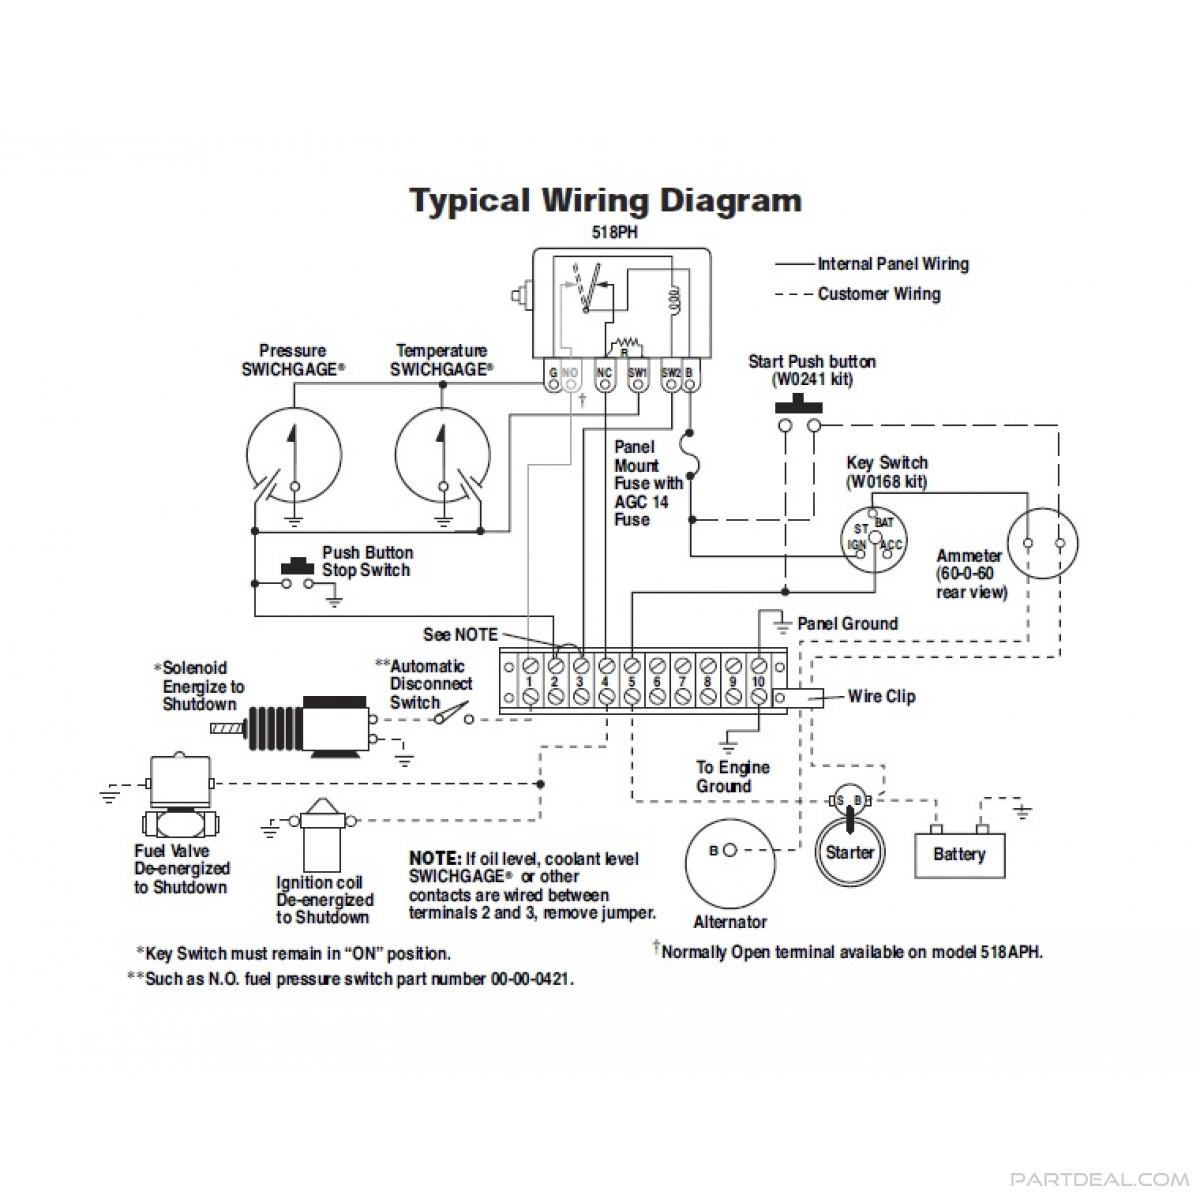 GH_7784] Water Alarm Wiring Diagrams For Oil Free DiagramVulg Trons Winn Xortanet Salv Mohammedshrine Librar Wiring 101